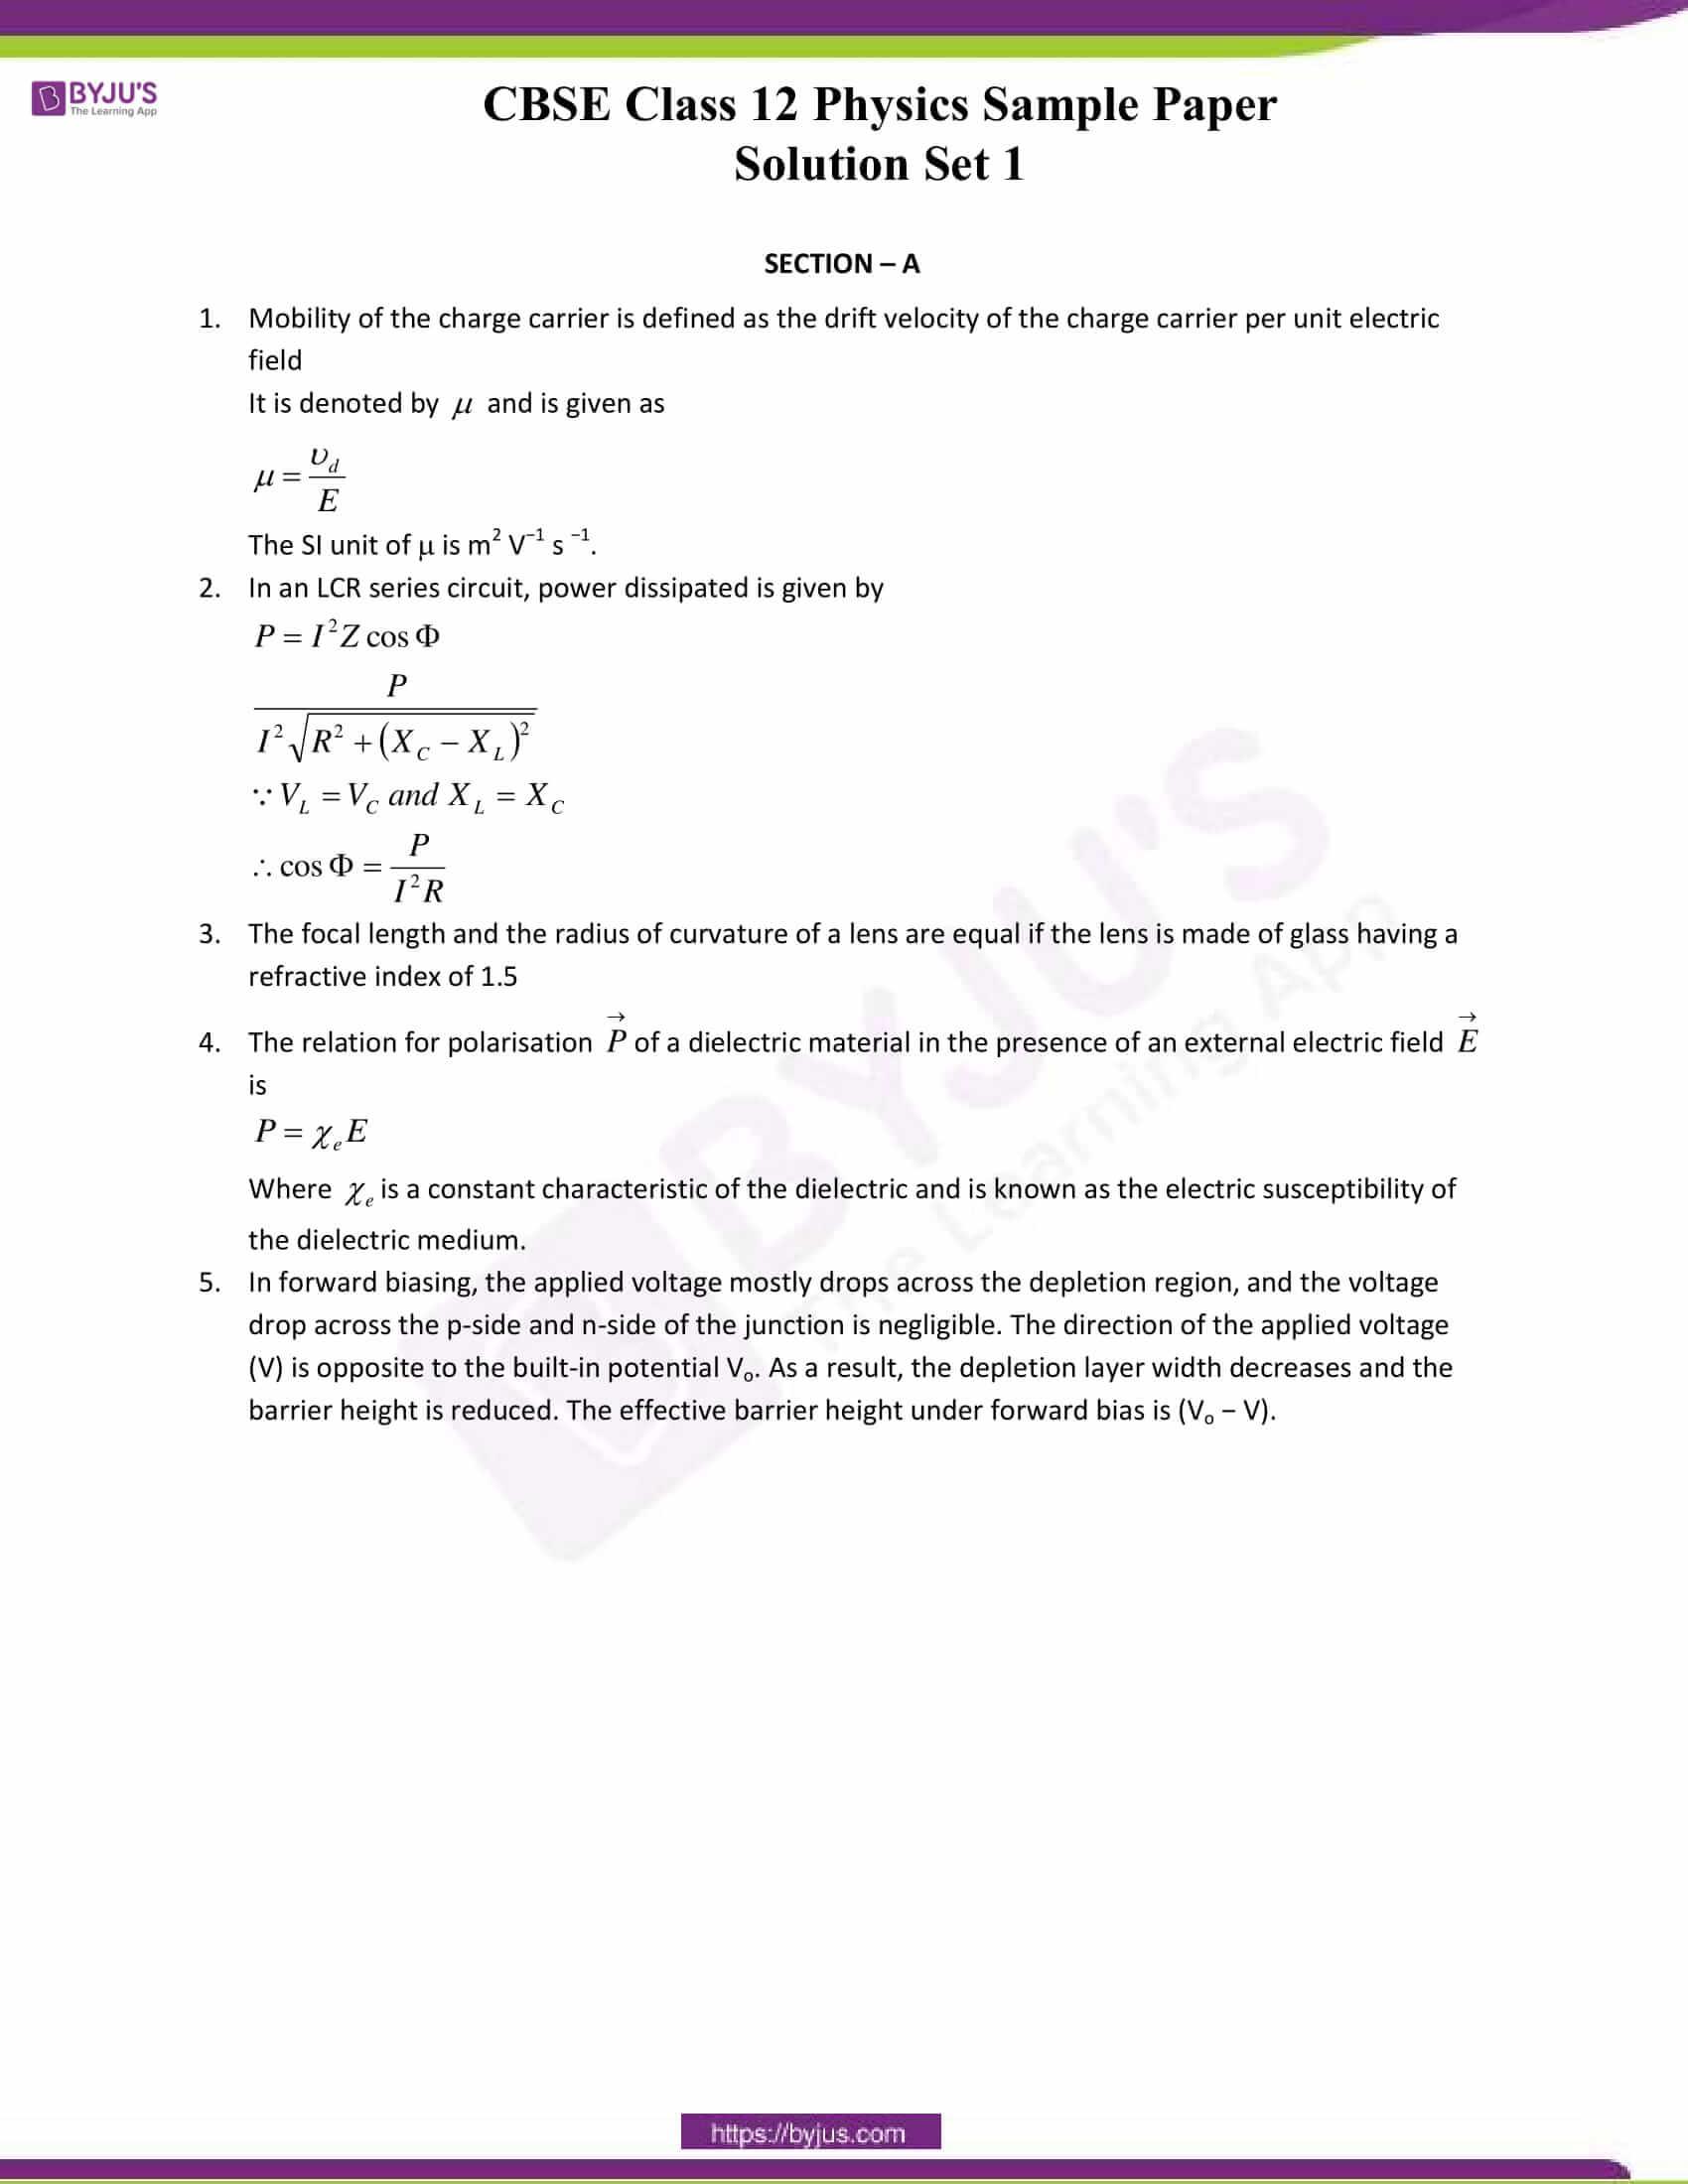 cbse class 12 physics sample paper solution set 1